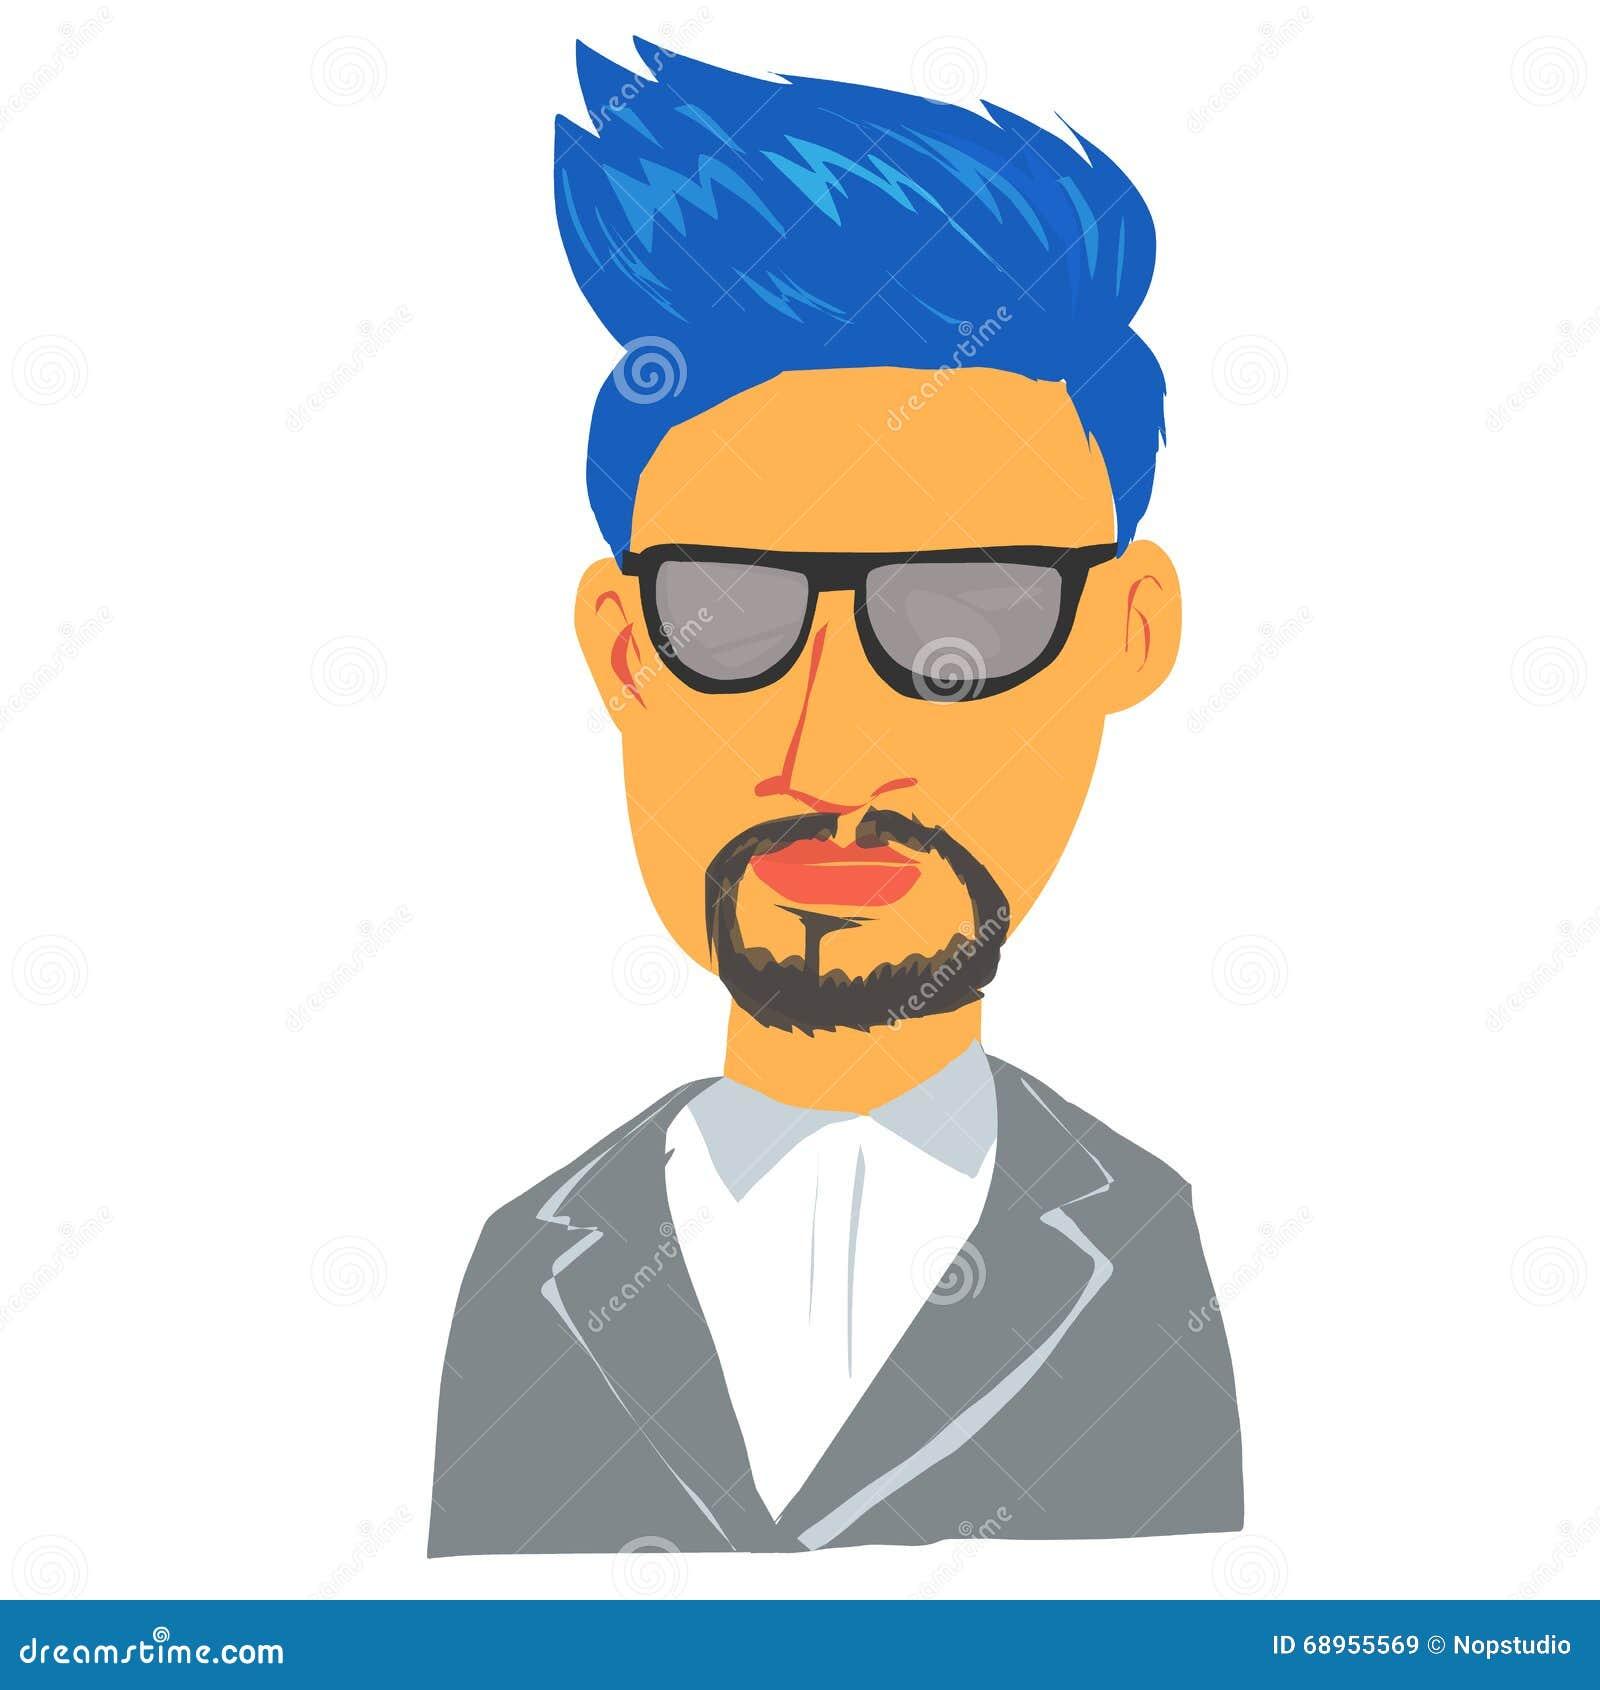 Cartoon Characters With Blue Hair : Blue hair man cartoon character stock vector image